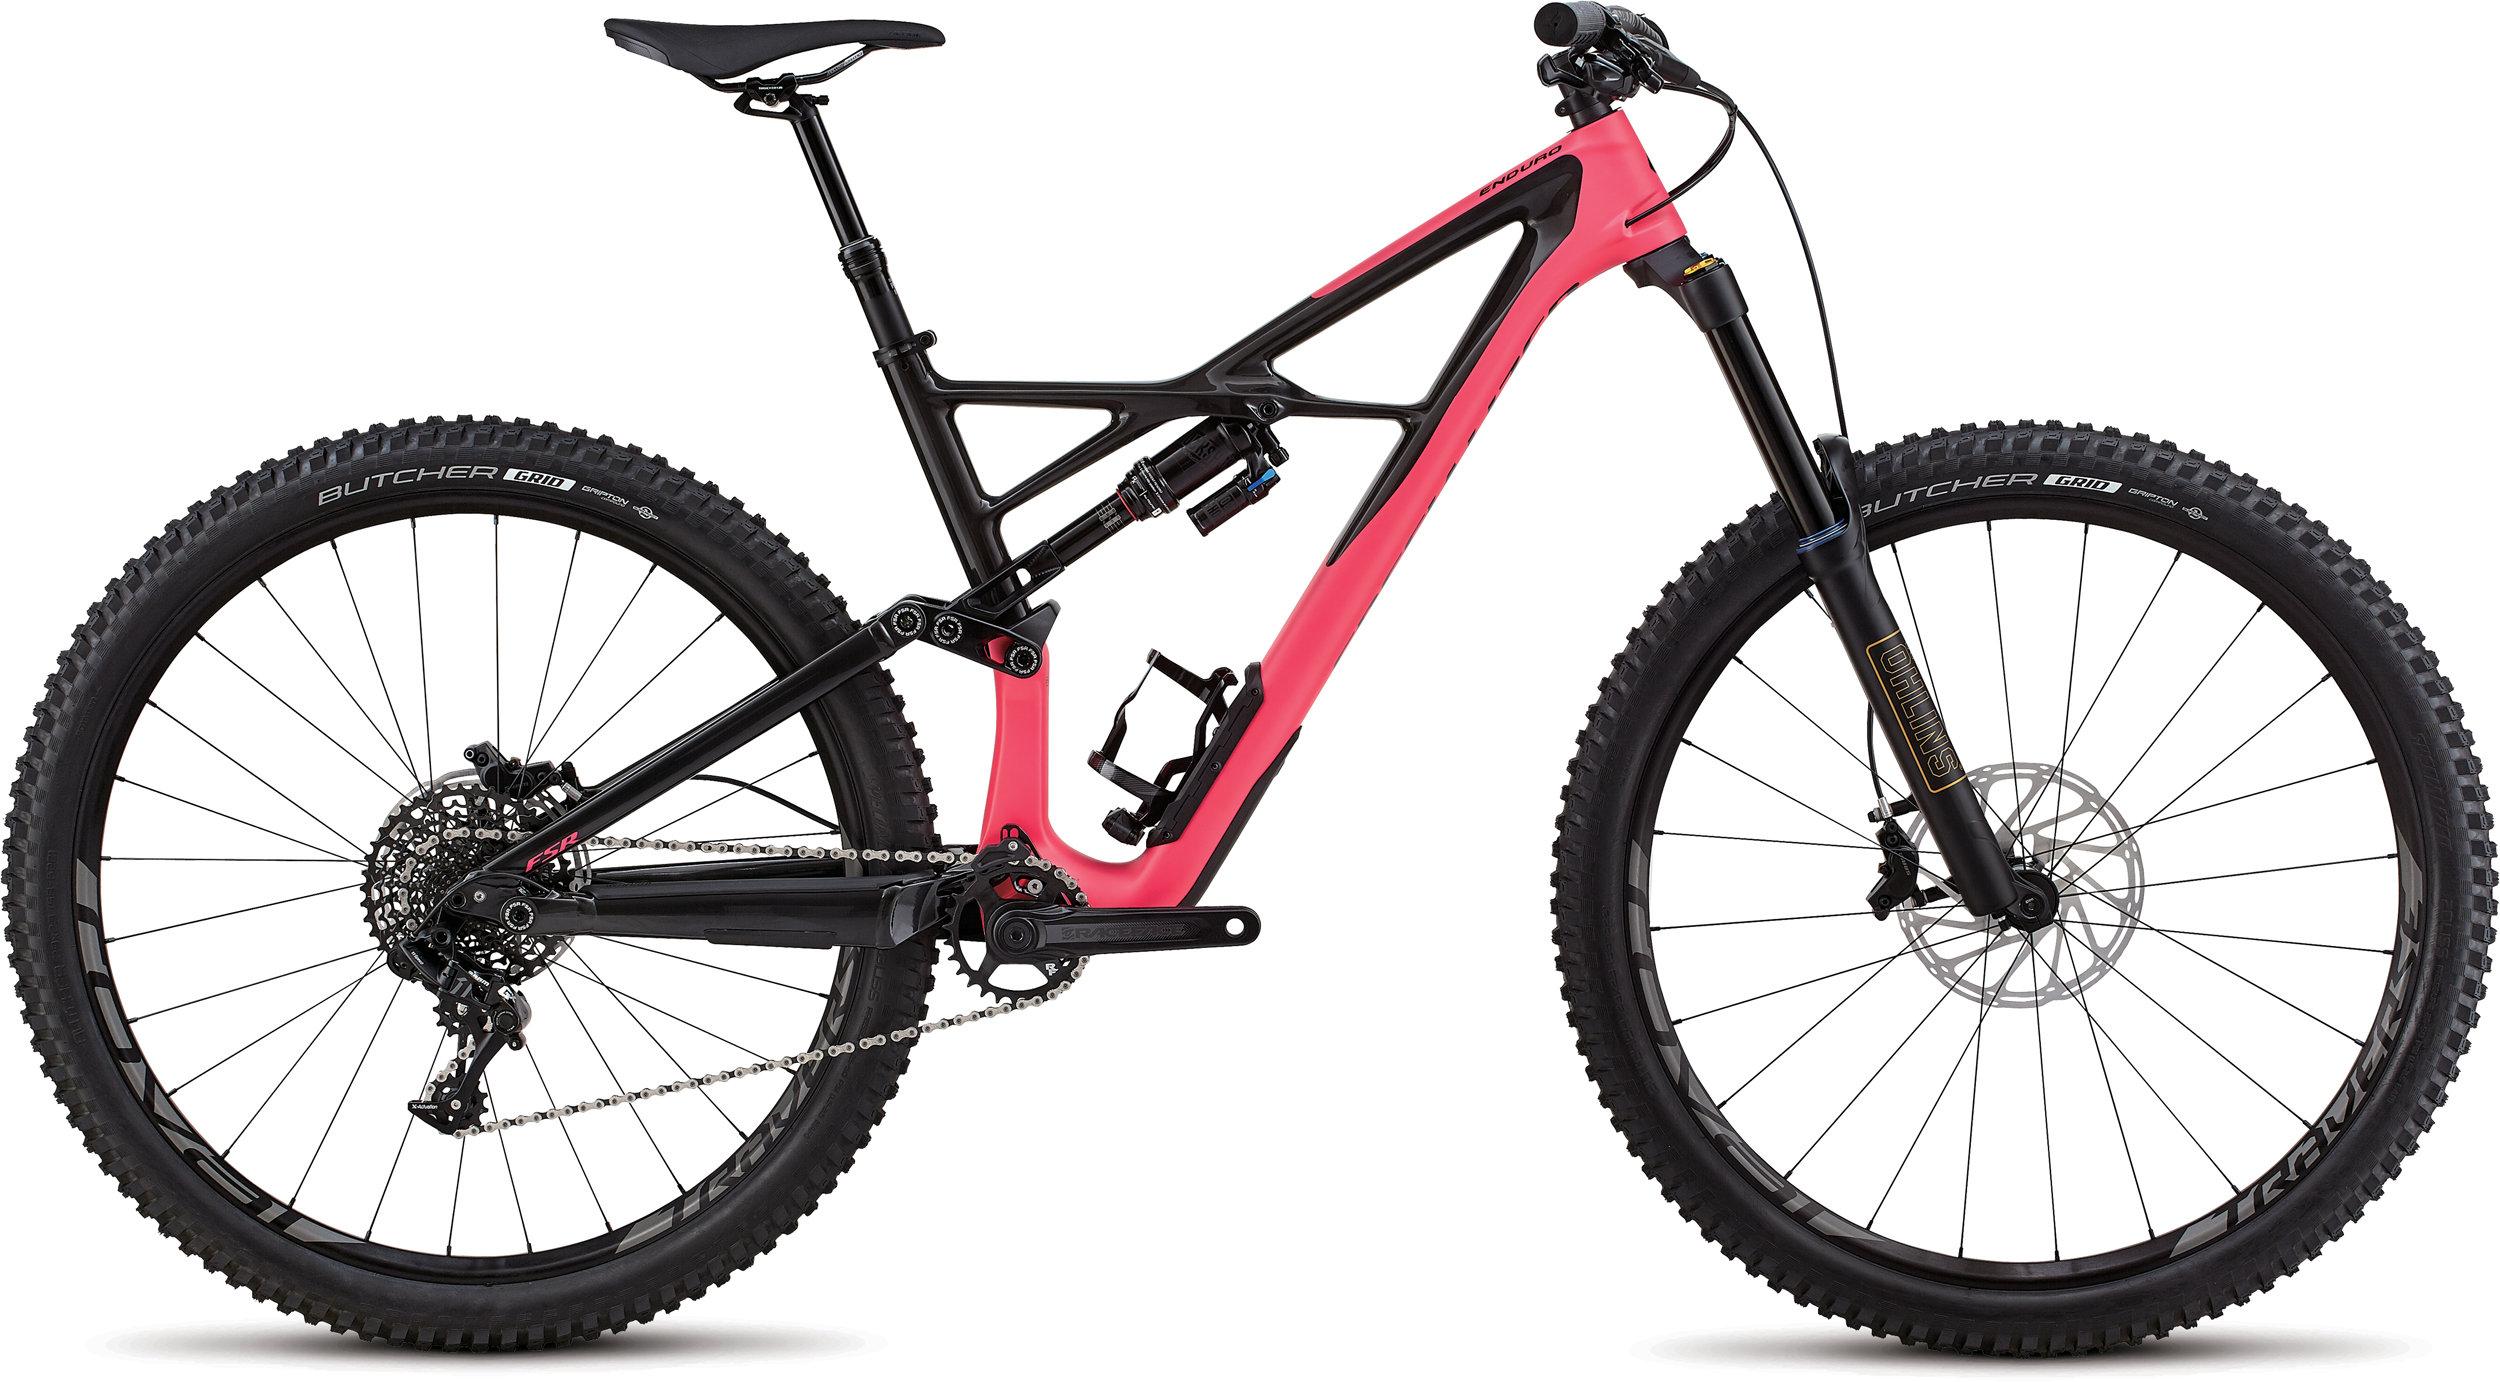 Specialized Enduro Elite 29/6Fattie SATIN GLOSS ACID PINK / CARBON L - Alpha Bikes